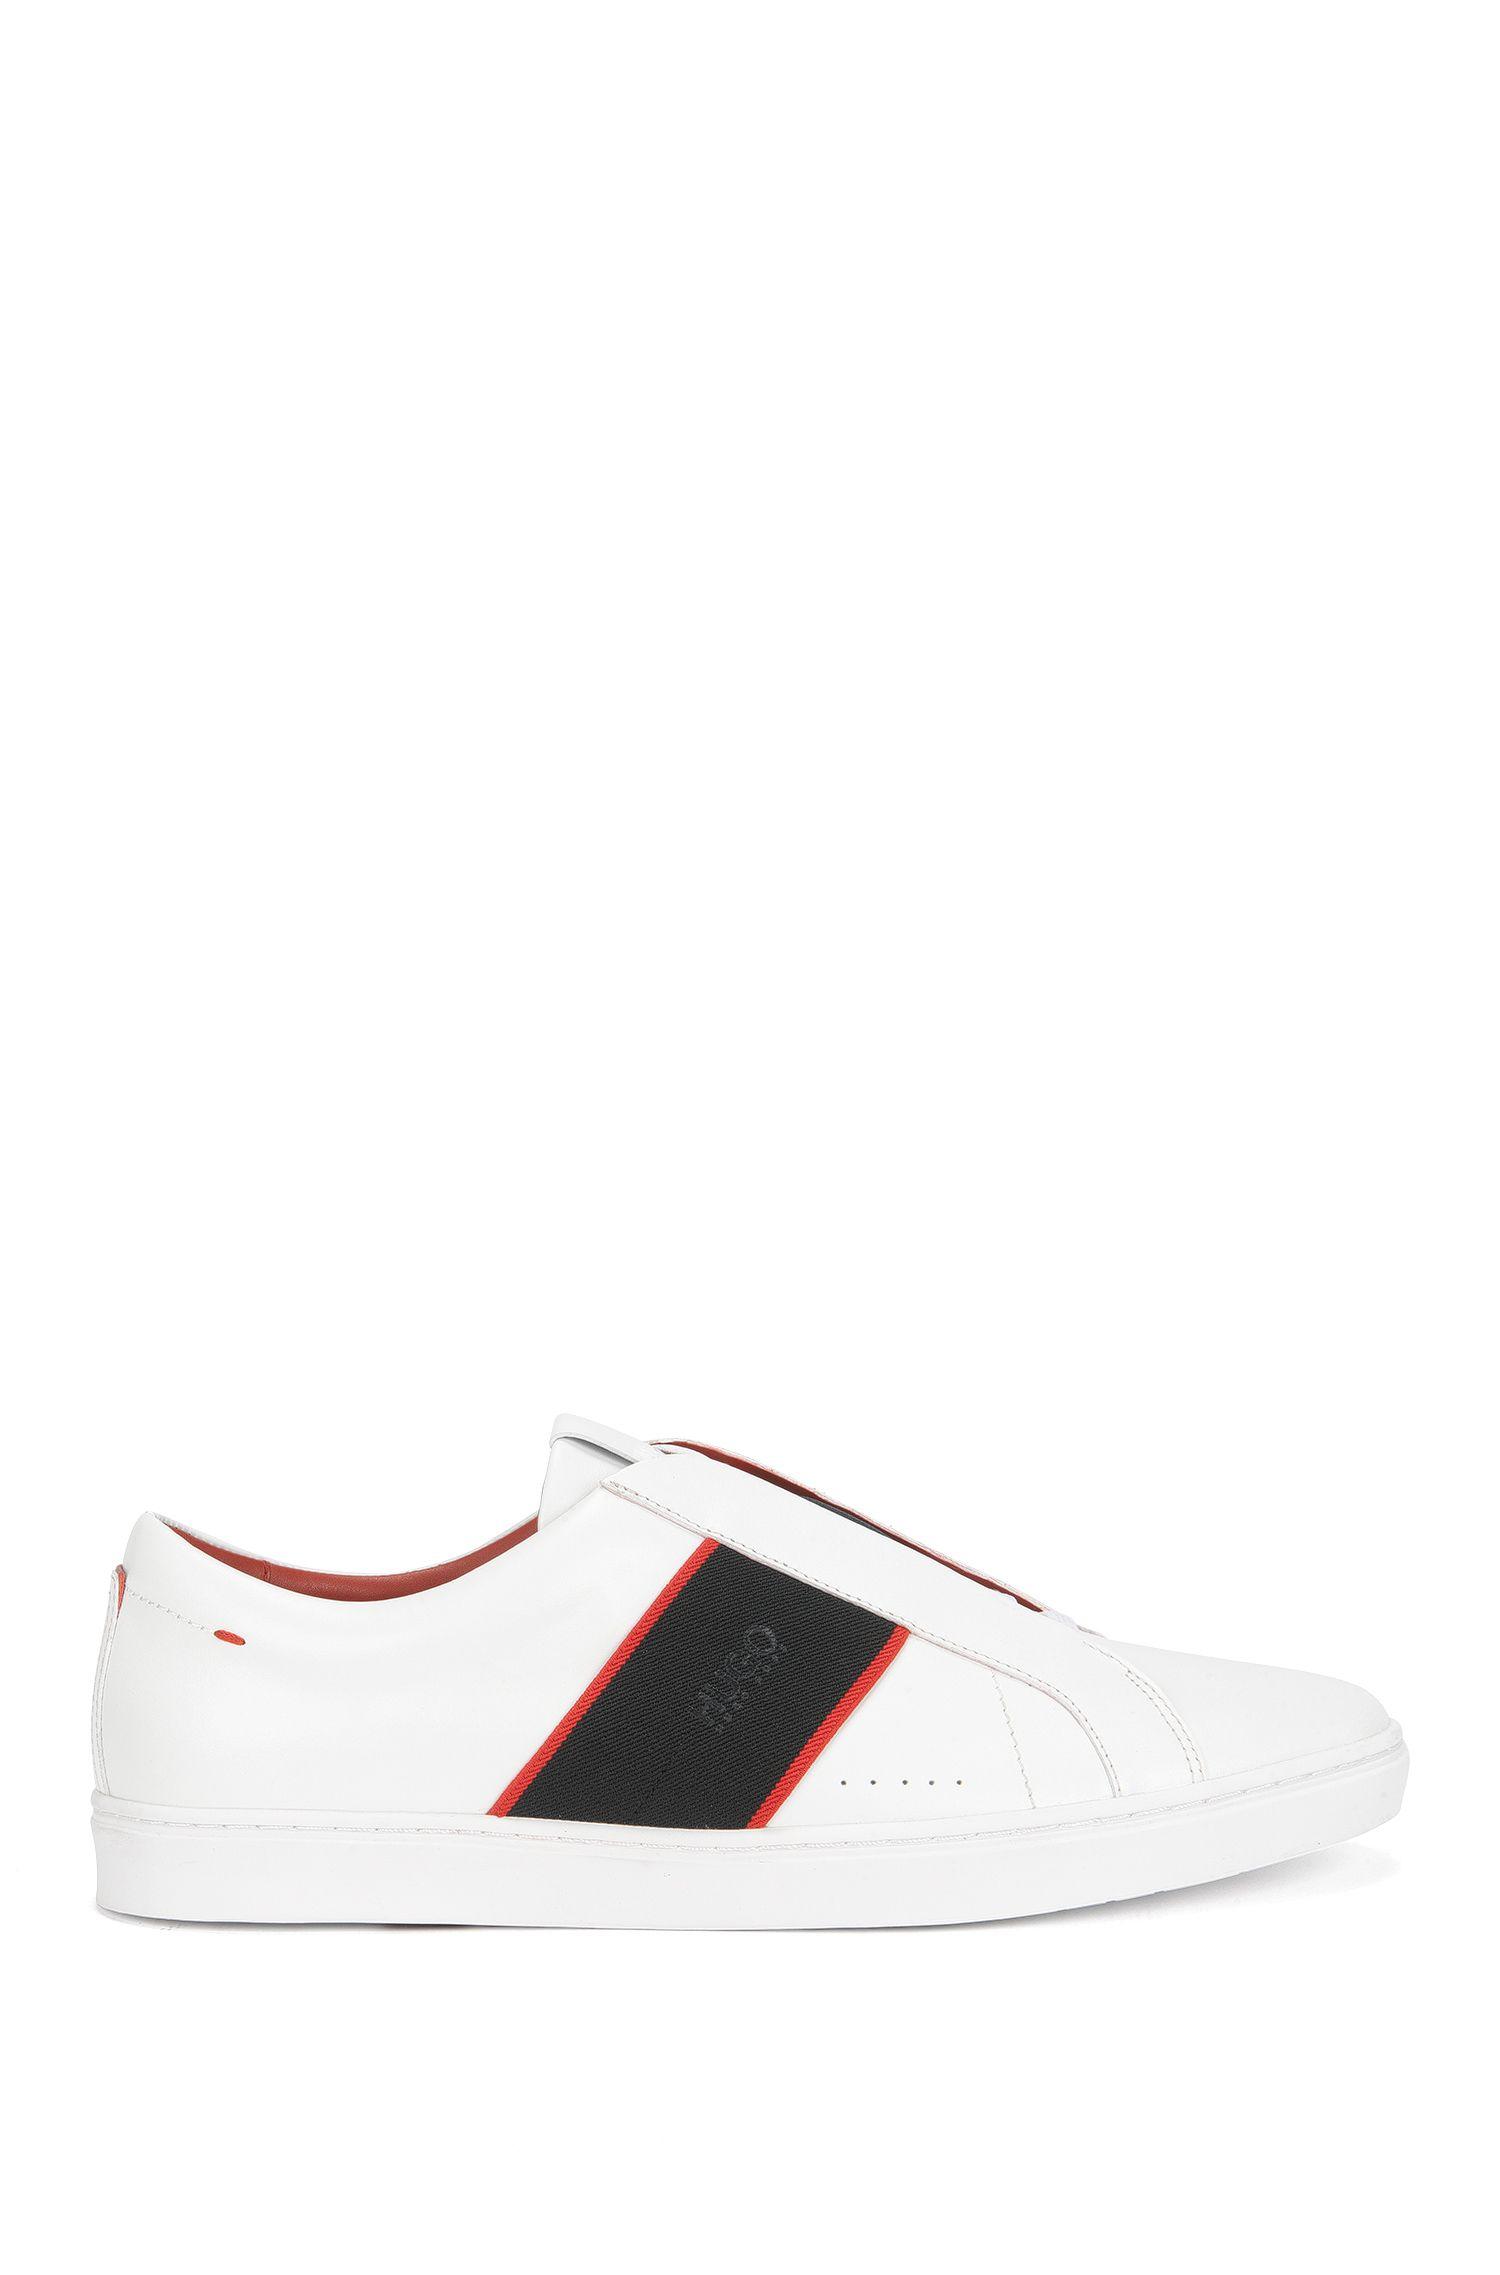 Sneakers slip-on in pelle nappa